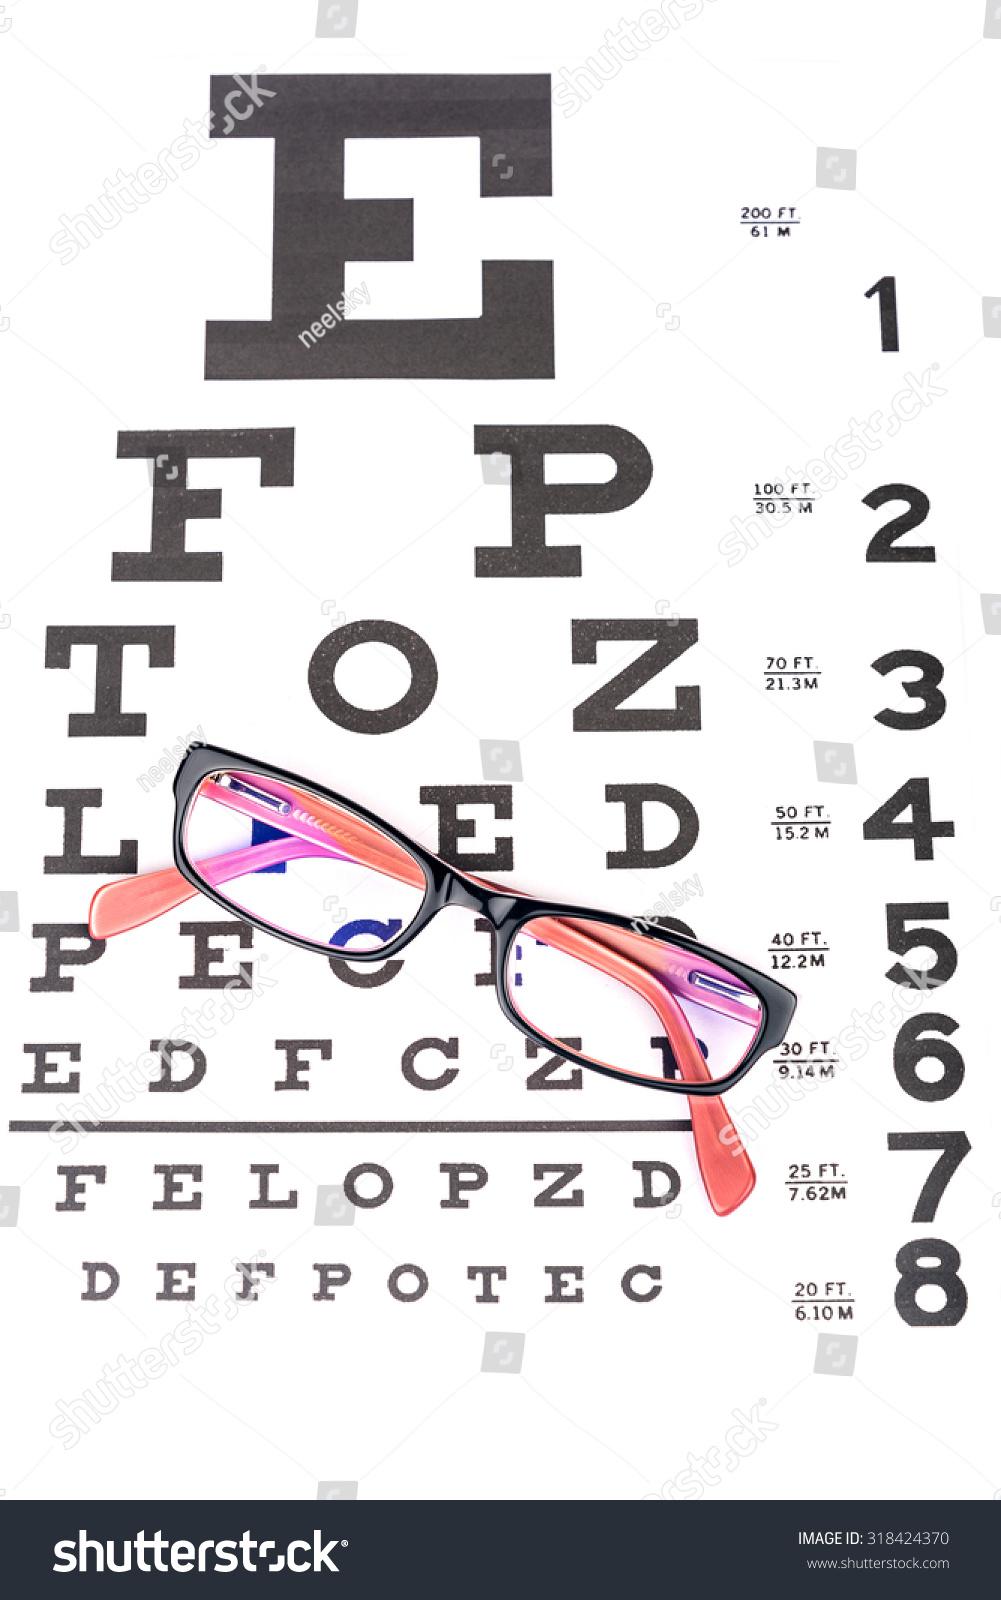 Snellen eye chart printable free choice image free any chart examples printable snellen eye chart image collections free any chart printable snellen eye chart images free any nvjuhfo Choice Image